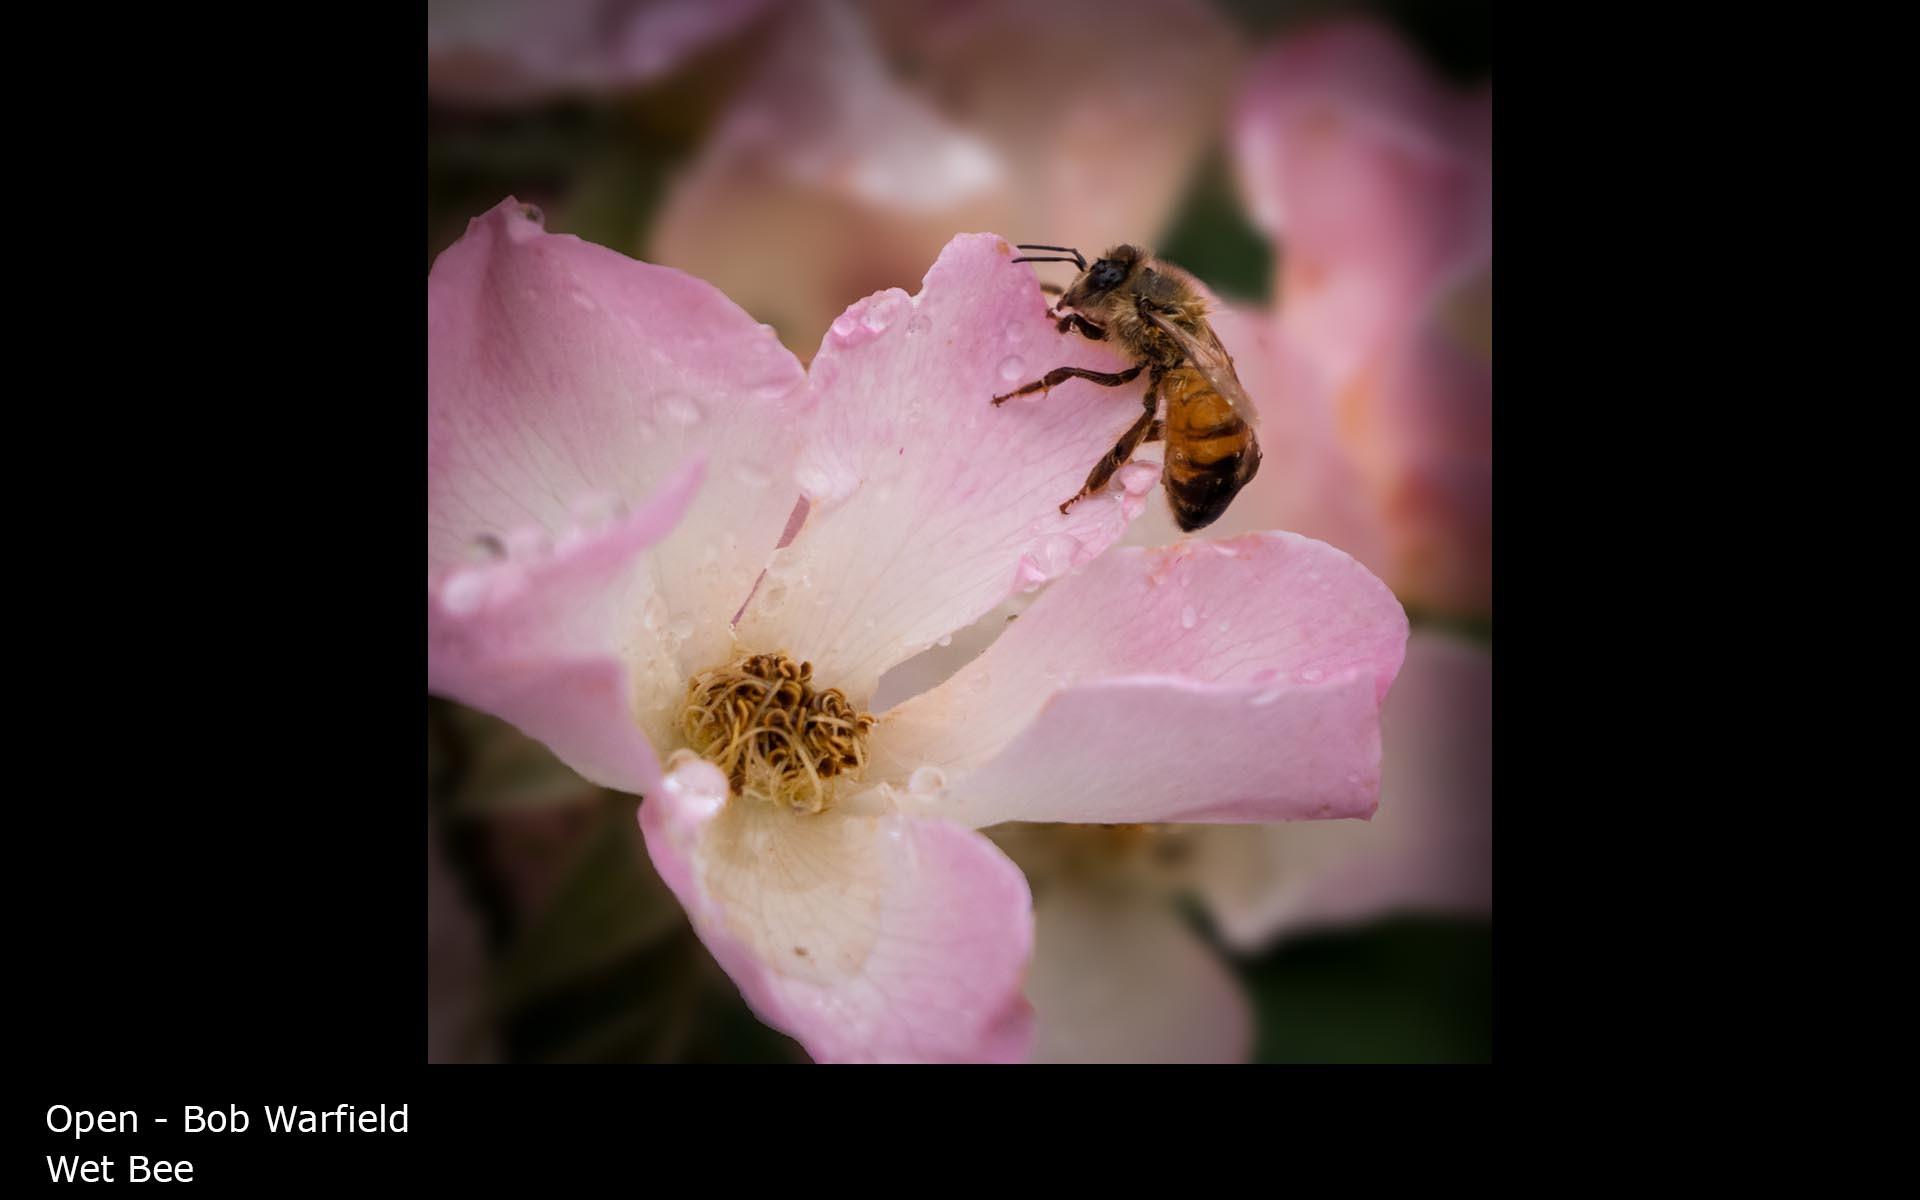 Wet Bee - Bob Warfield